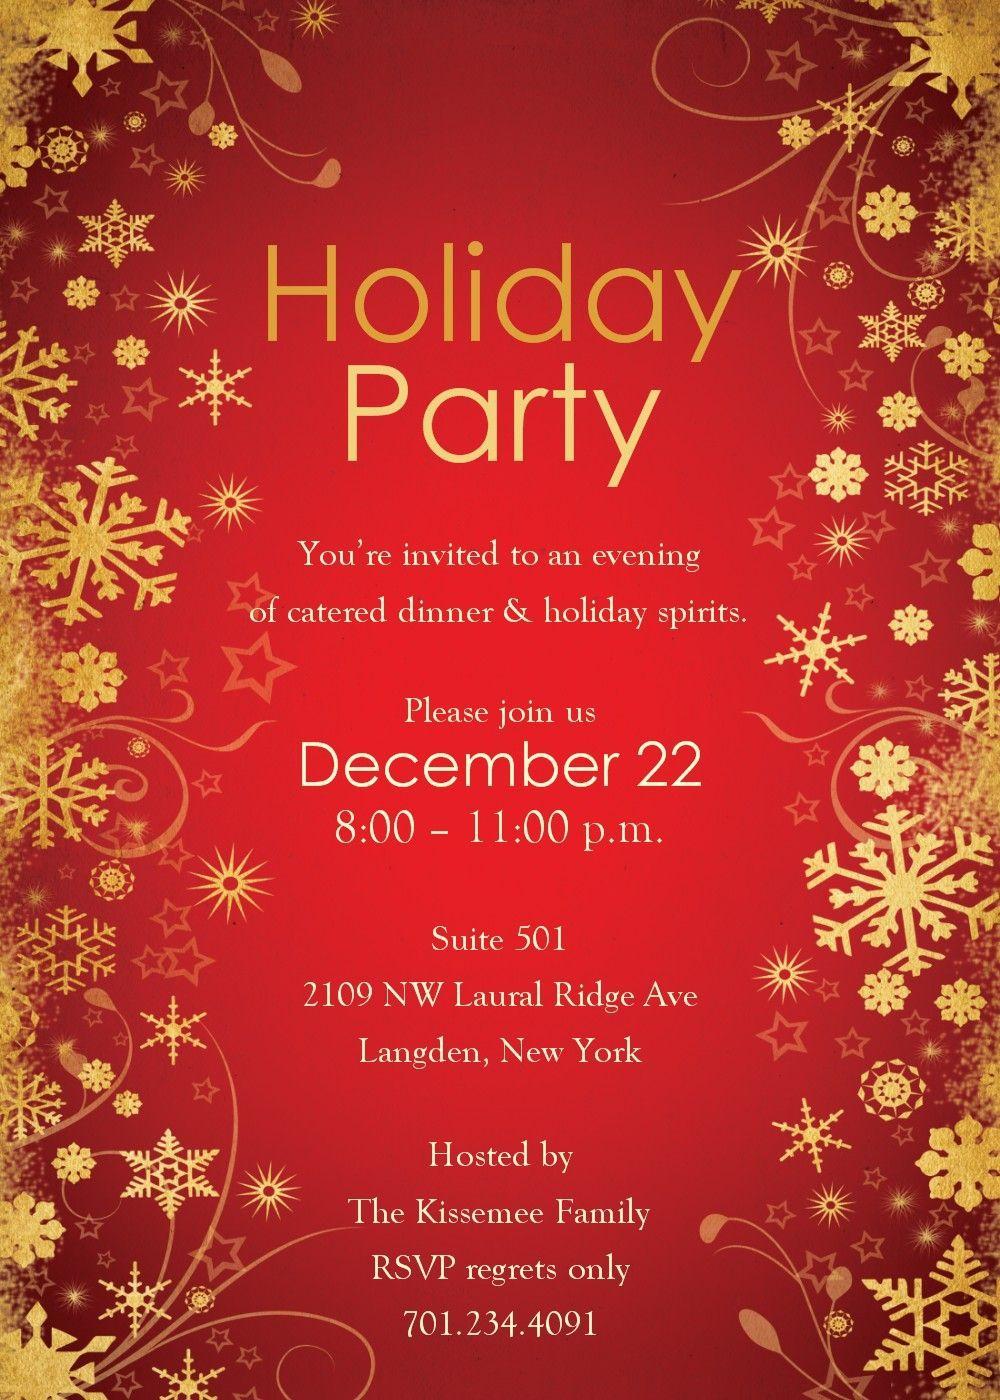 007 Breathtaking Party Invite Template Word Design  Holiday Invitation Wording Sample Retirement Free EditableFull